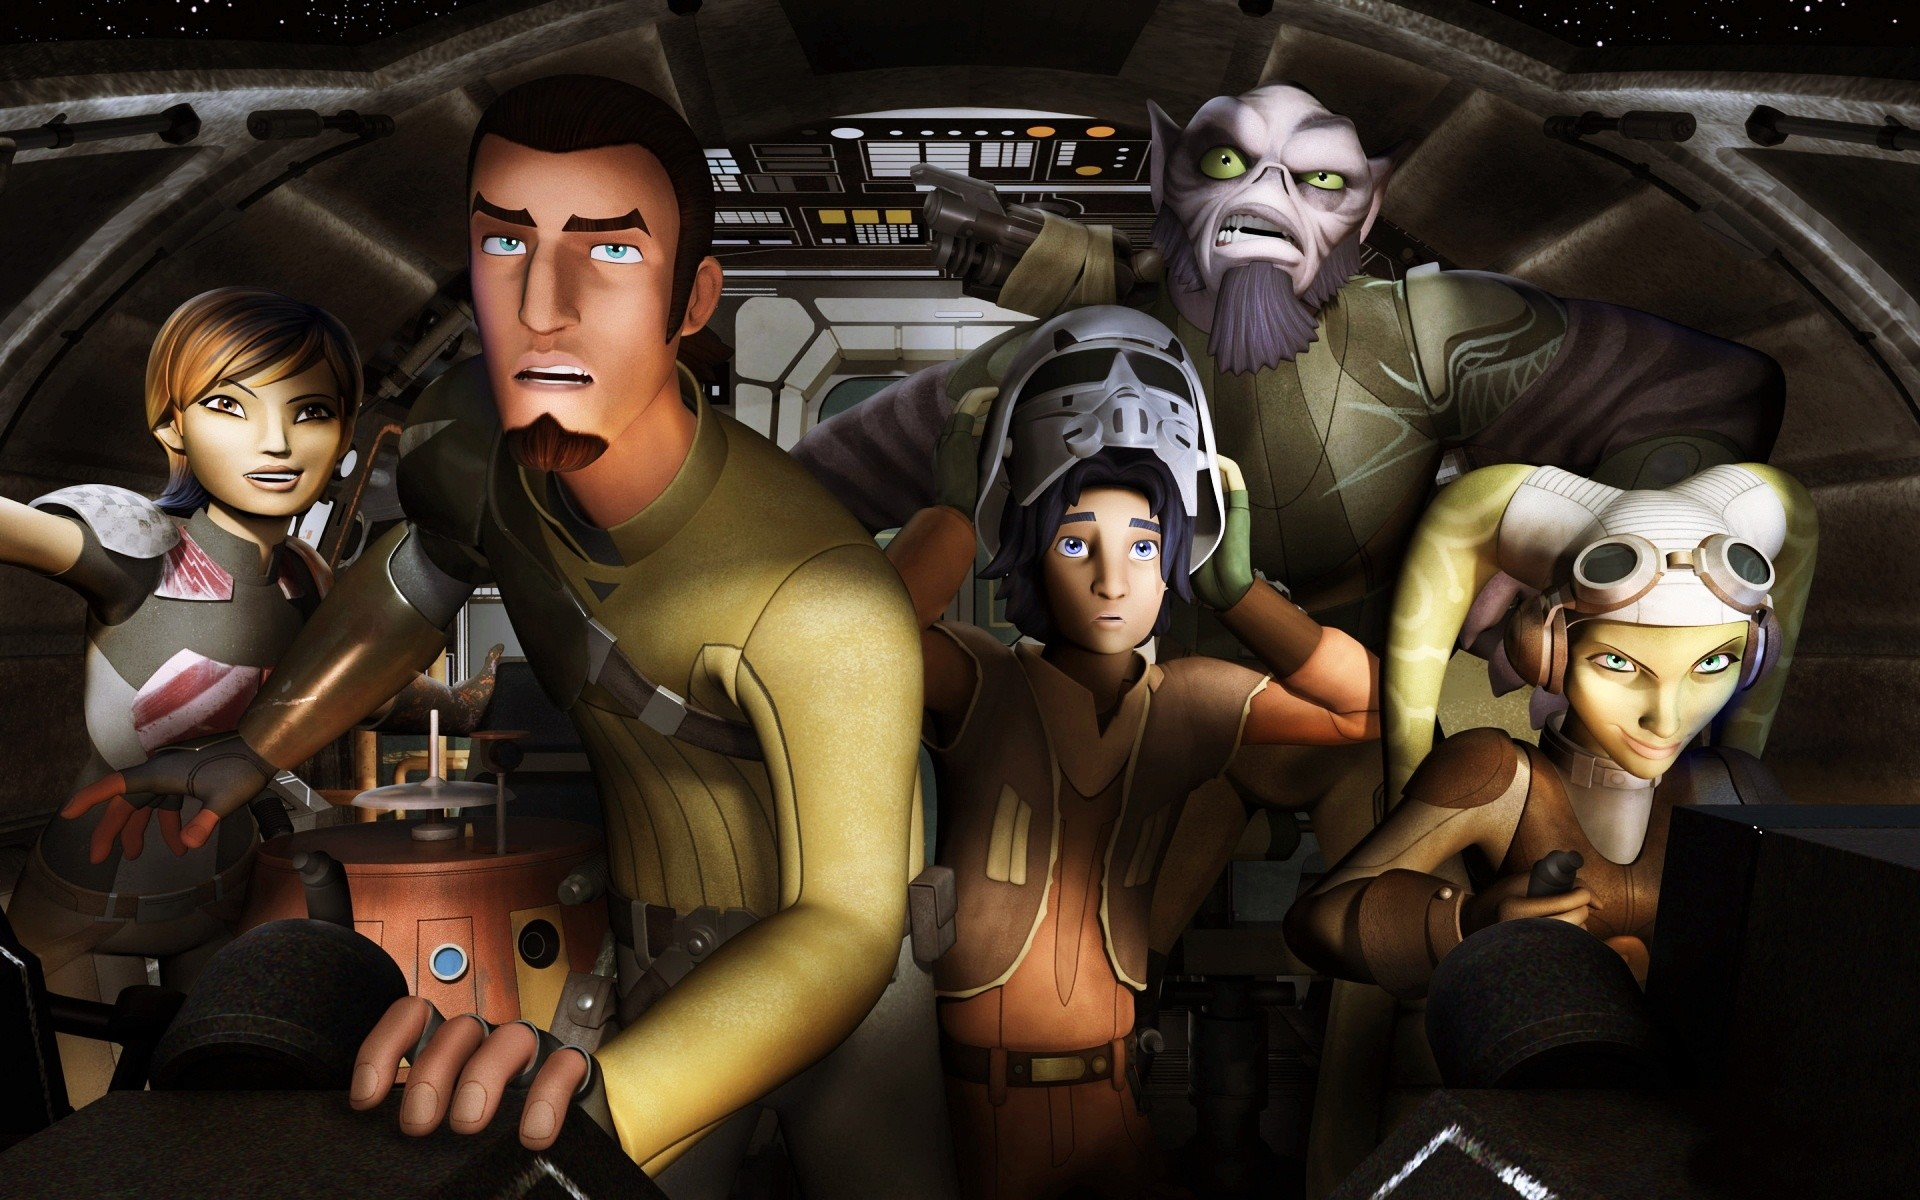 Star Wars Rebels Wallpaper